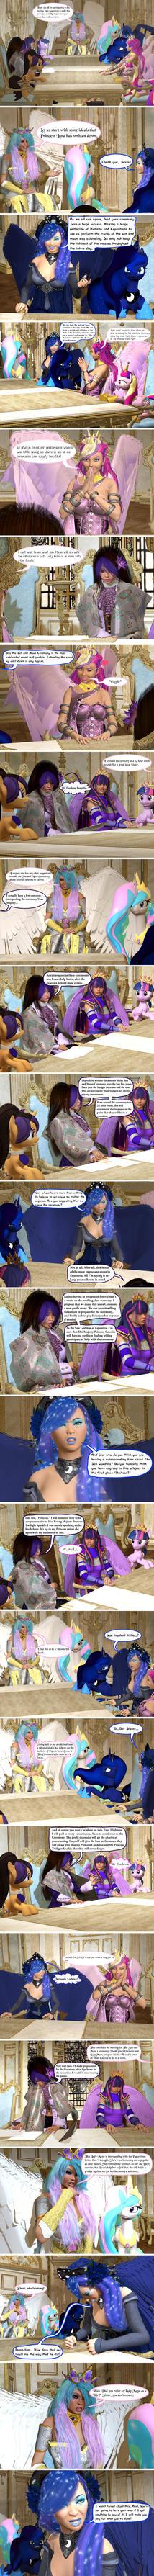 The Lunar Eclipse (Part 2) by Axel-Doi